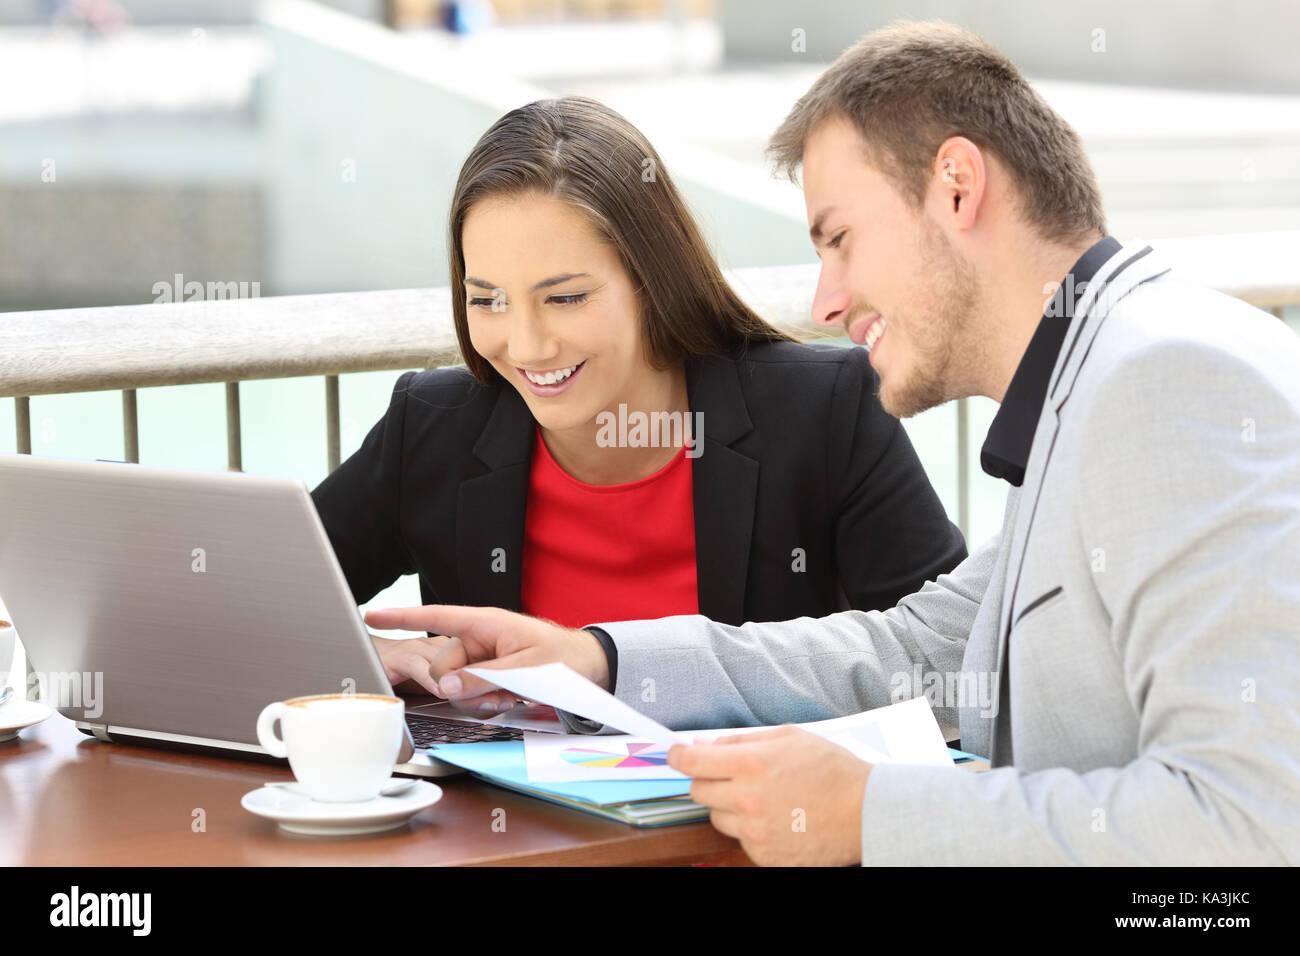 Dos ejecutivos que trabajan en línea con un ordenador portátil sentado en un bar terraza Imagen De Stock